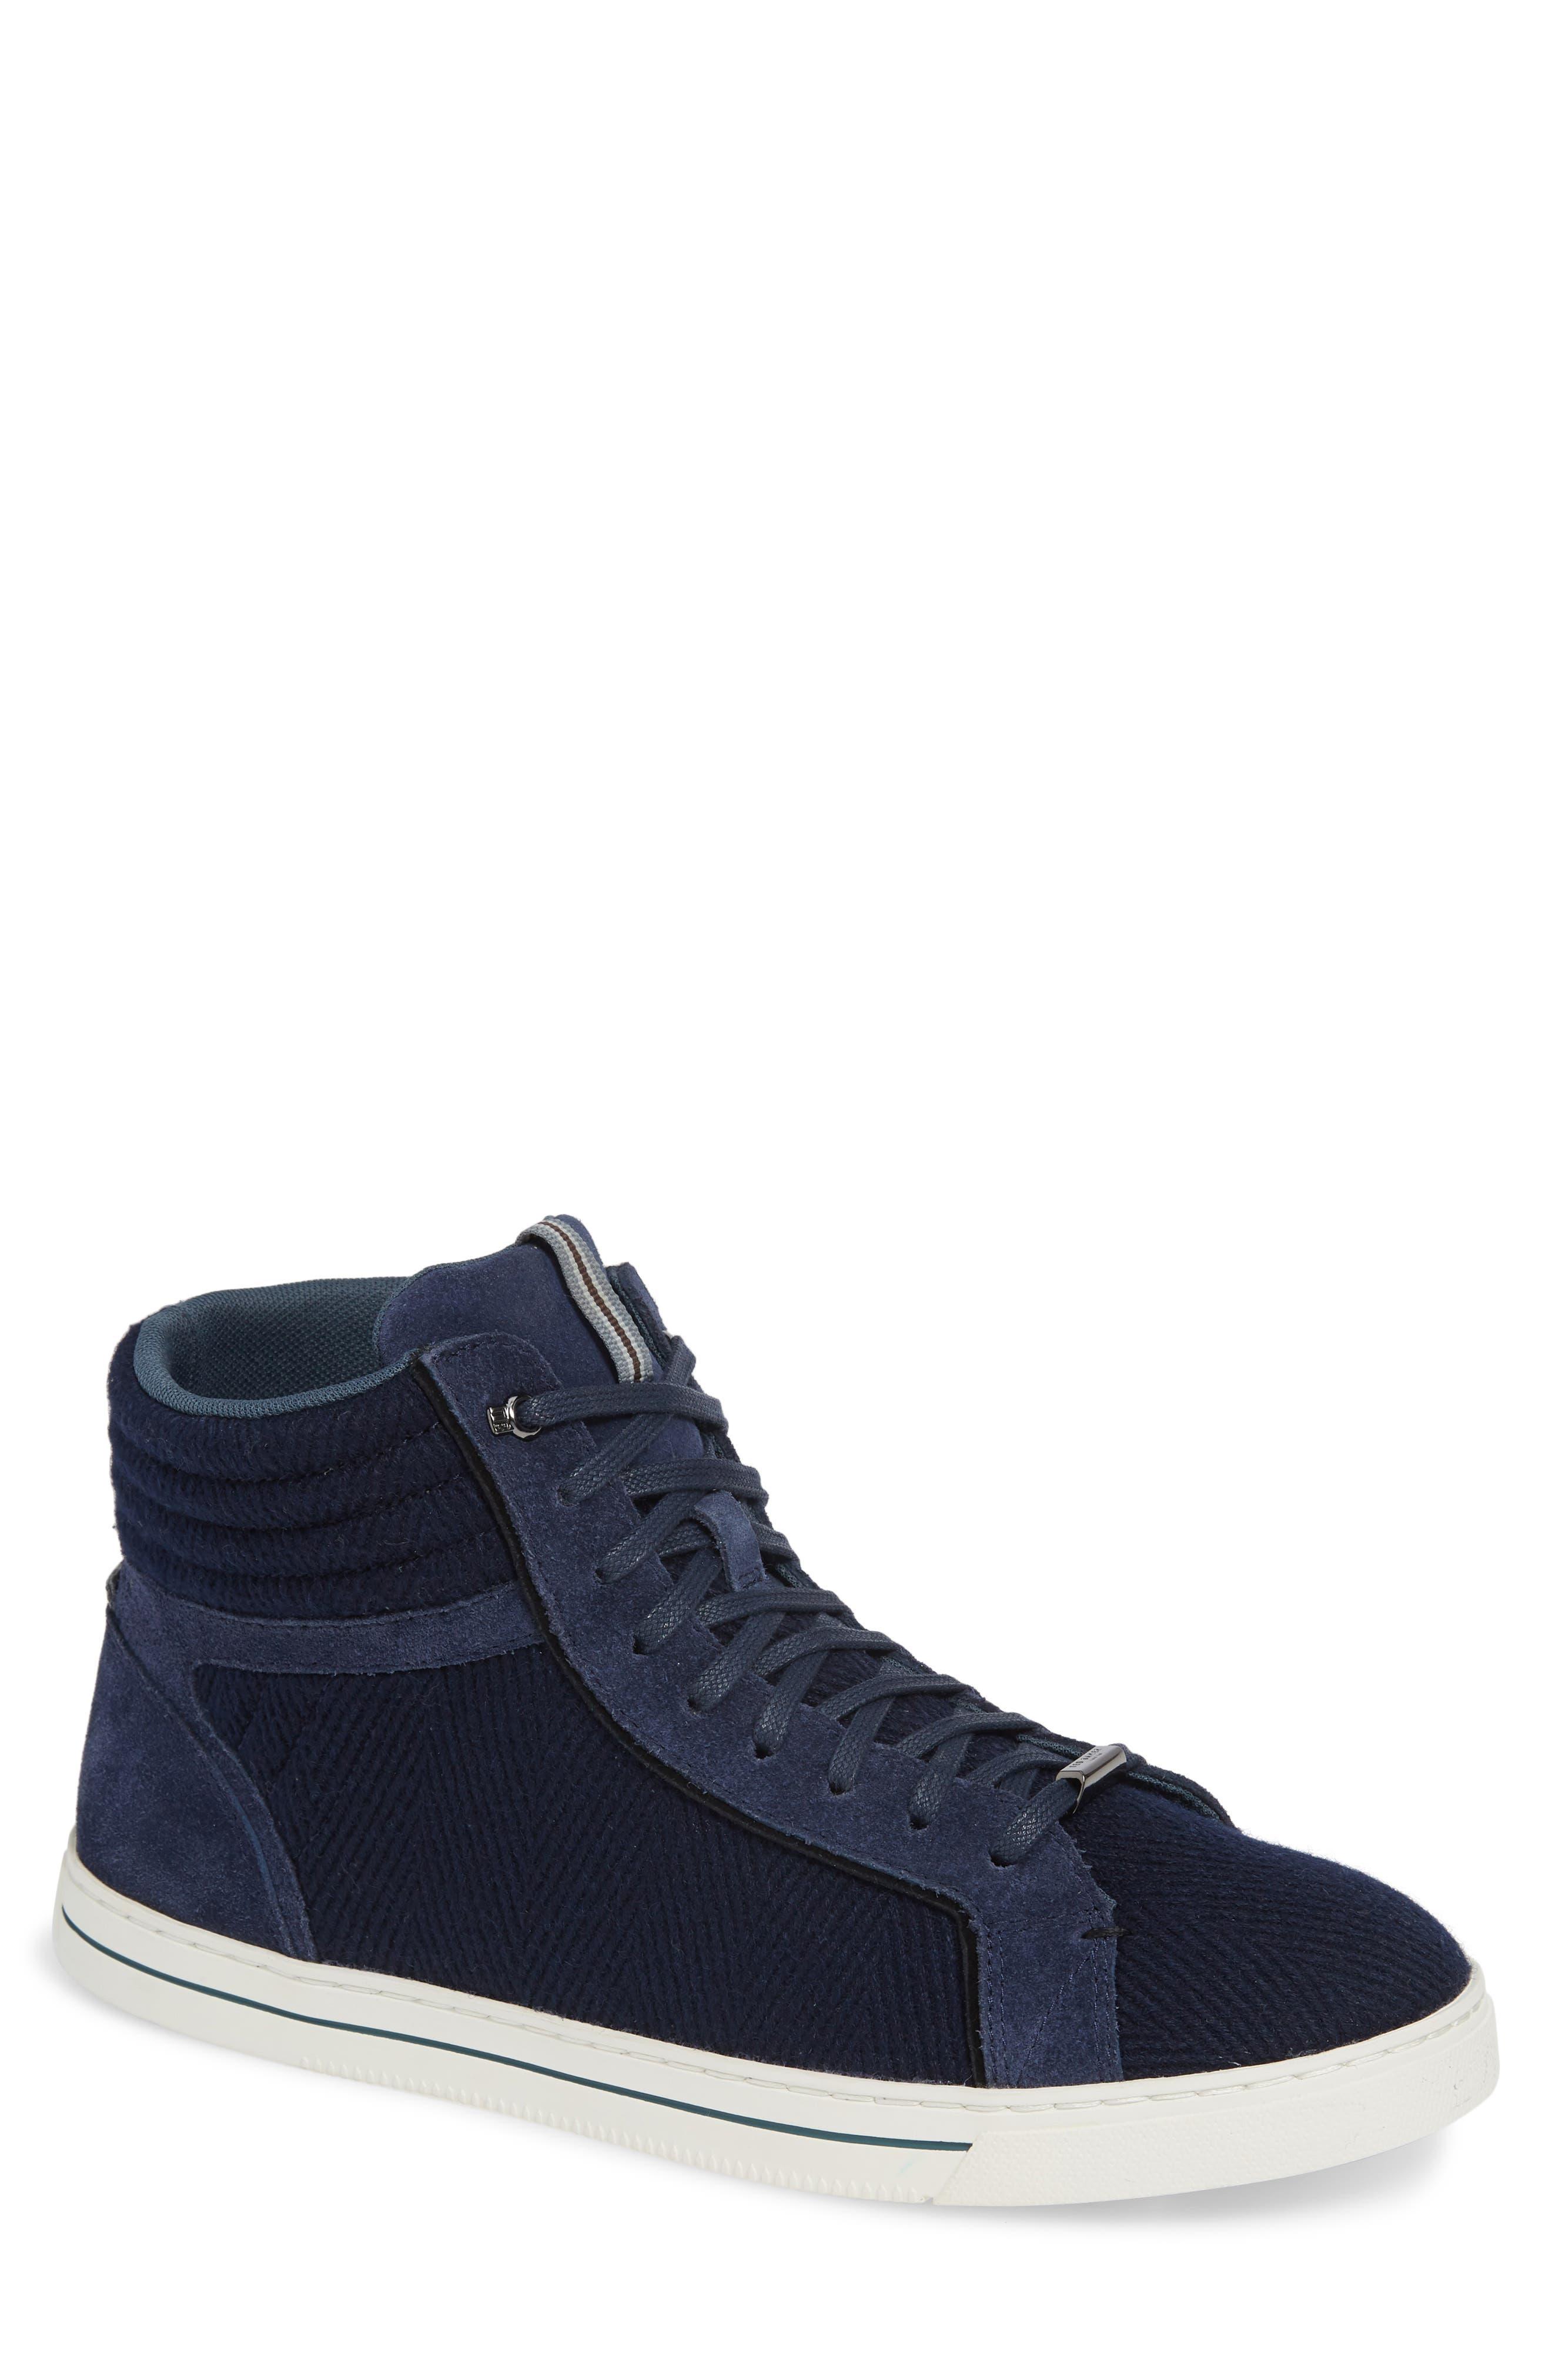 Luckan High Top Sneaker,                             Main thumbnail 1, color,                             DARK BLUE FABRIC